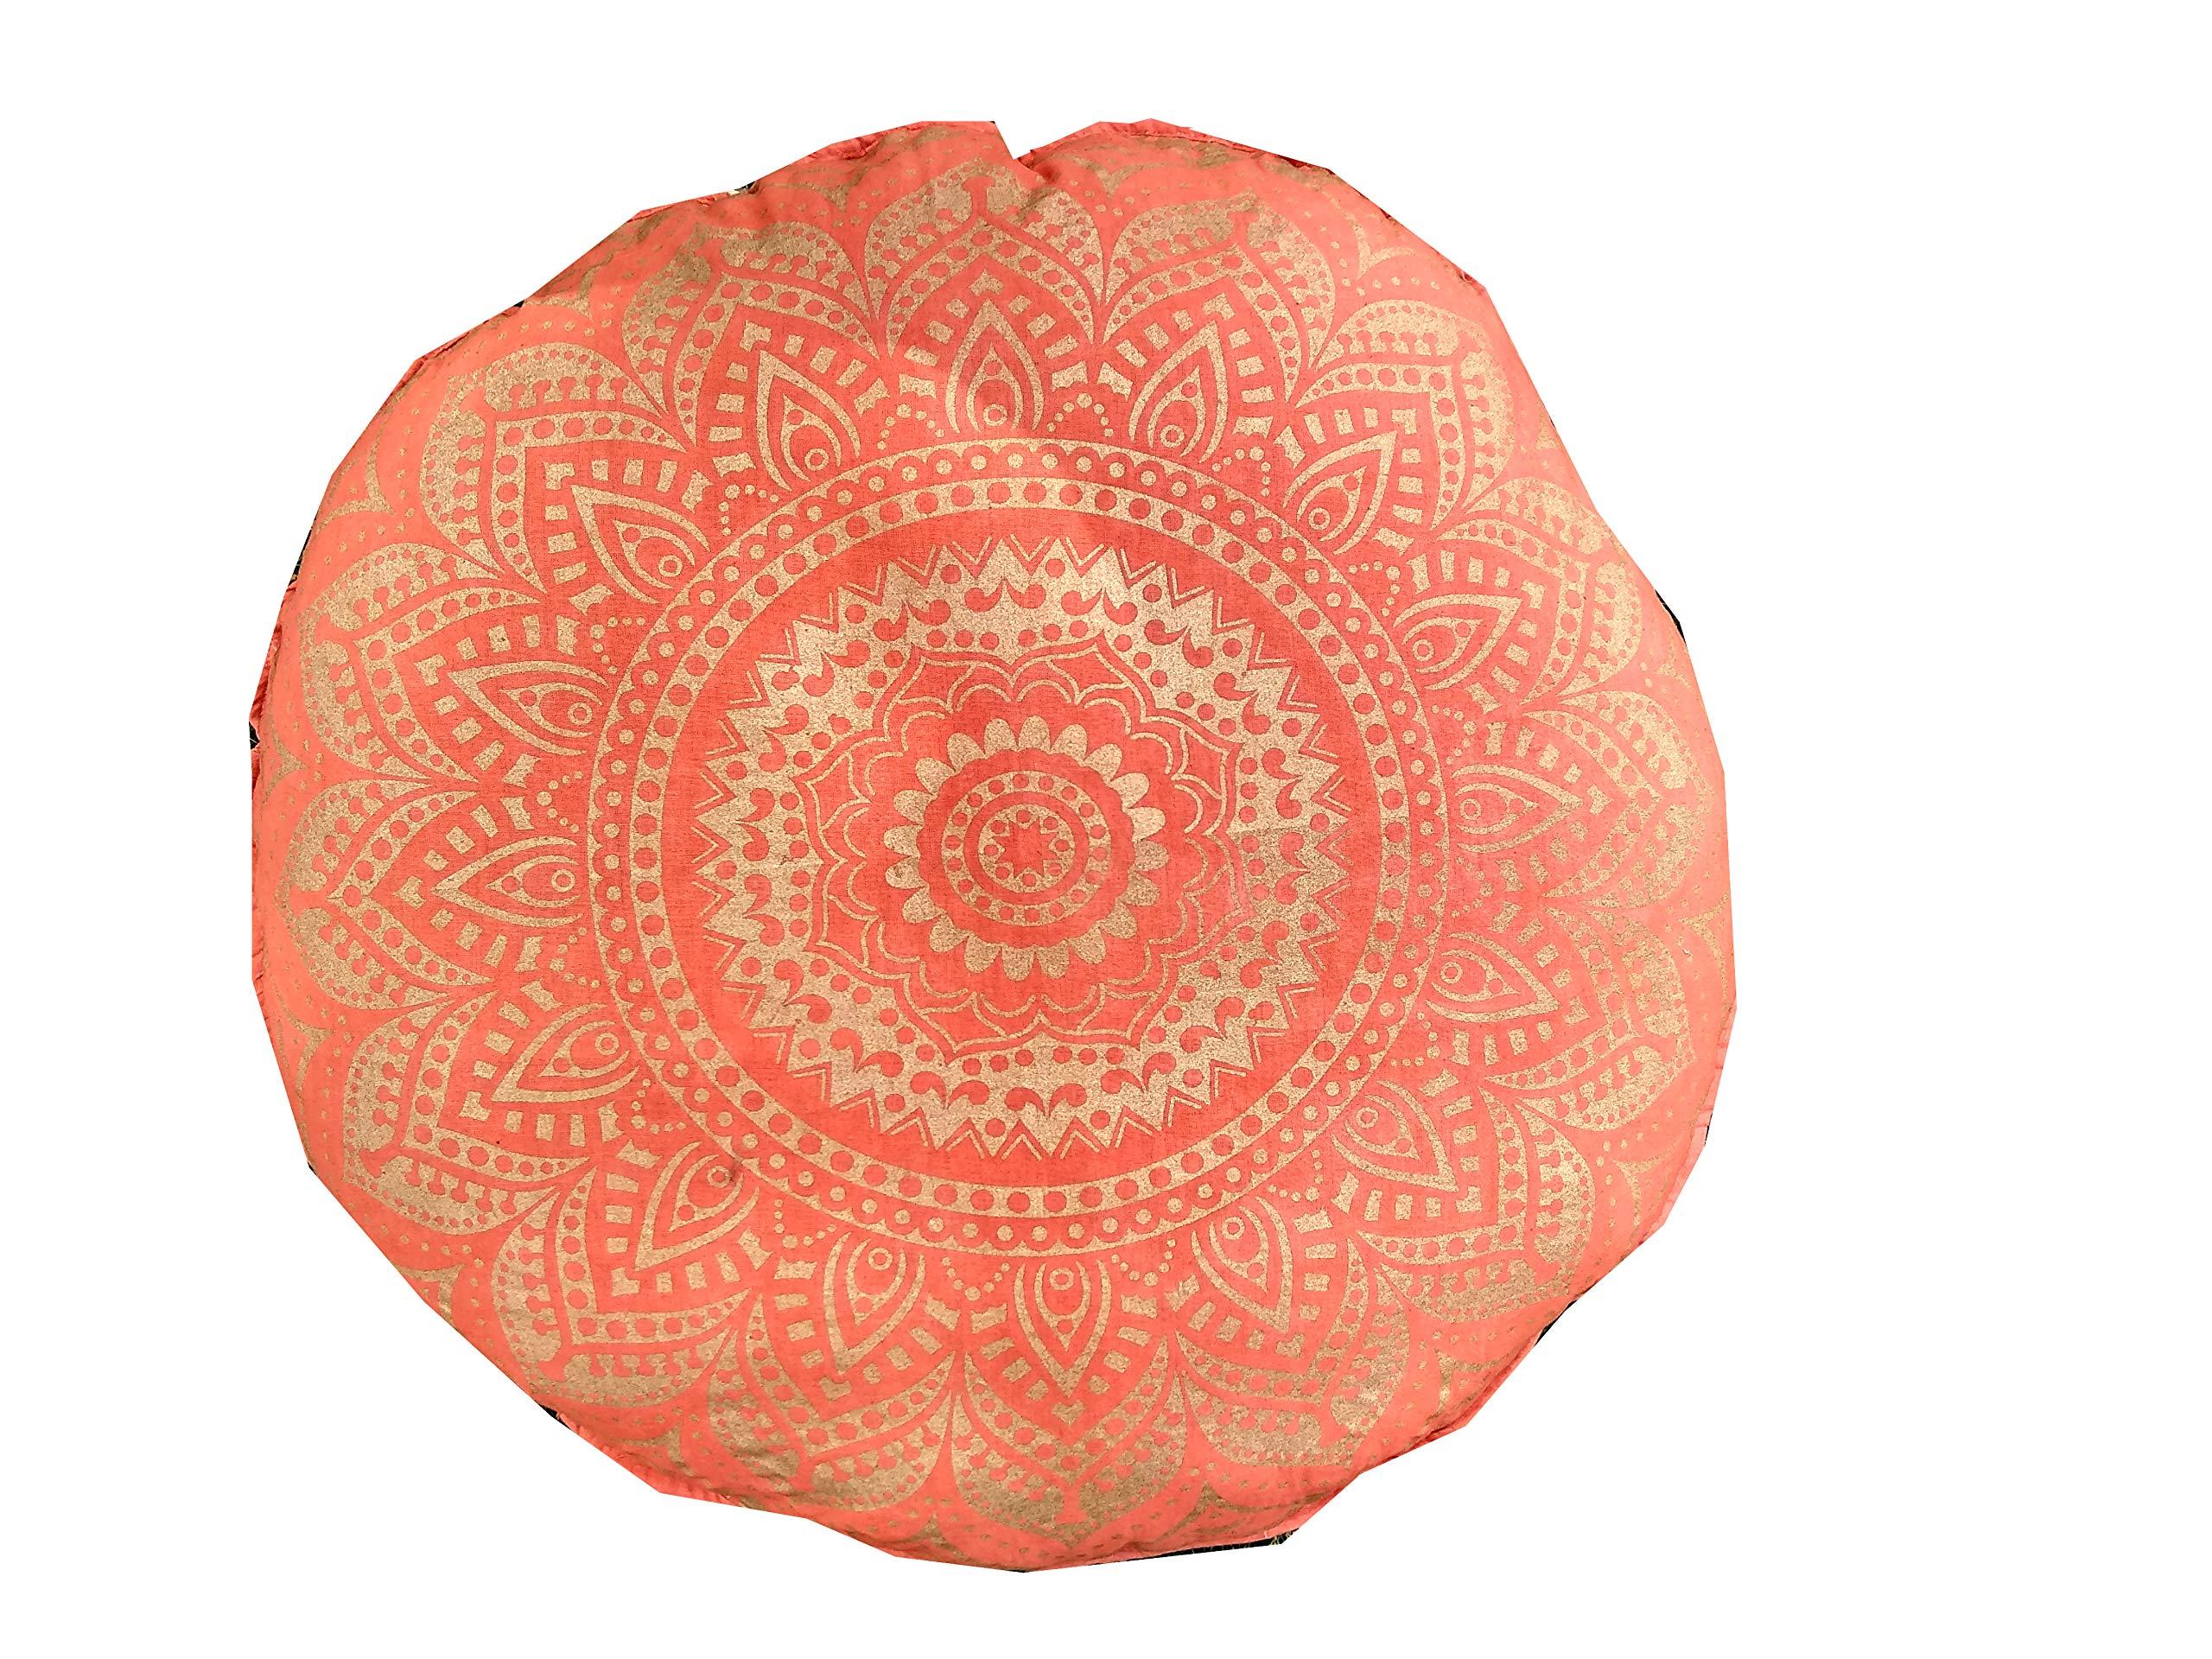 32'' Gold Mandala Barmeri Large Floor Pillow Cover Cushion Meditation Seating Ottoman Throw Cover Hippie Decorative Zipped Bohemian Pouf Ottoman Poufs, Pom Pom Pillow Cases (Orange)